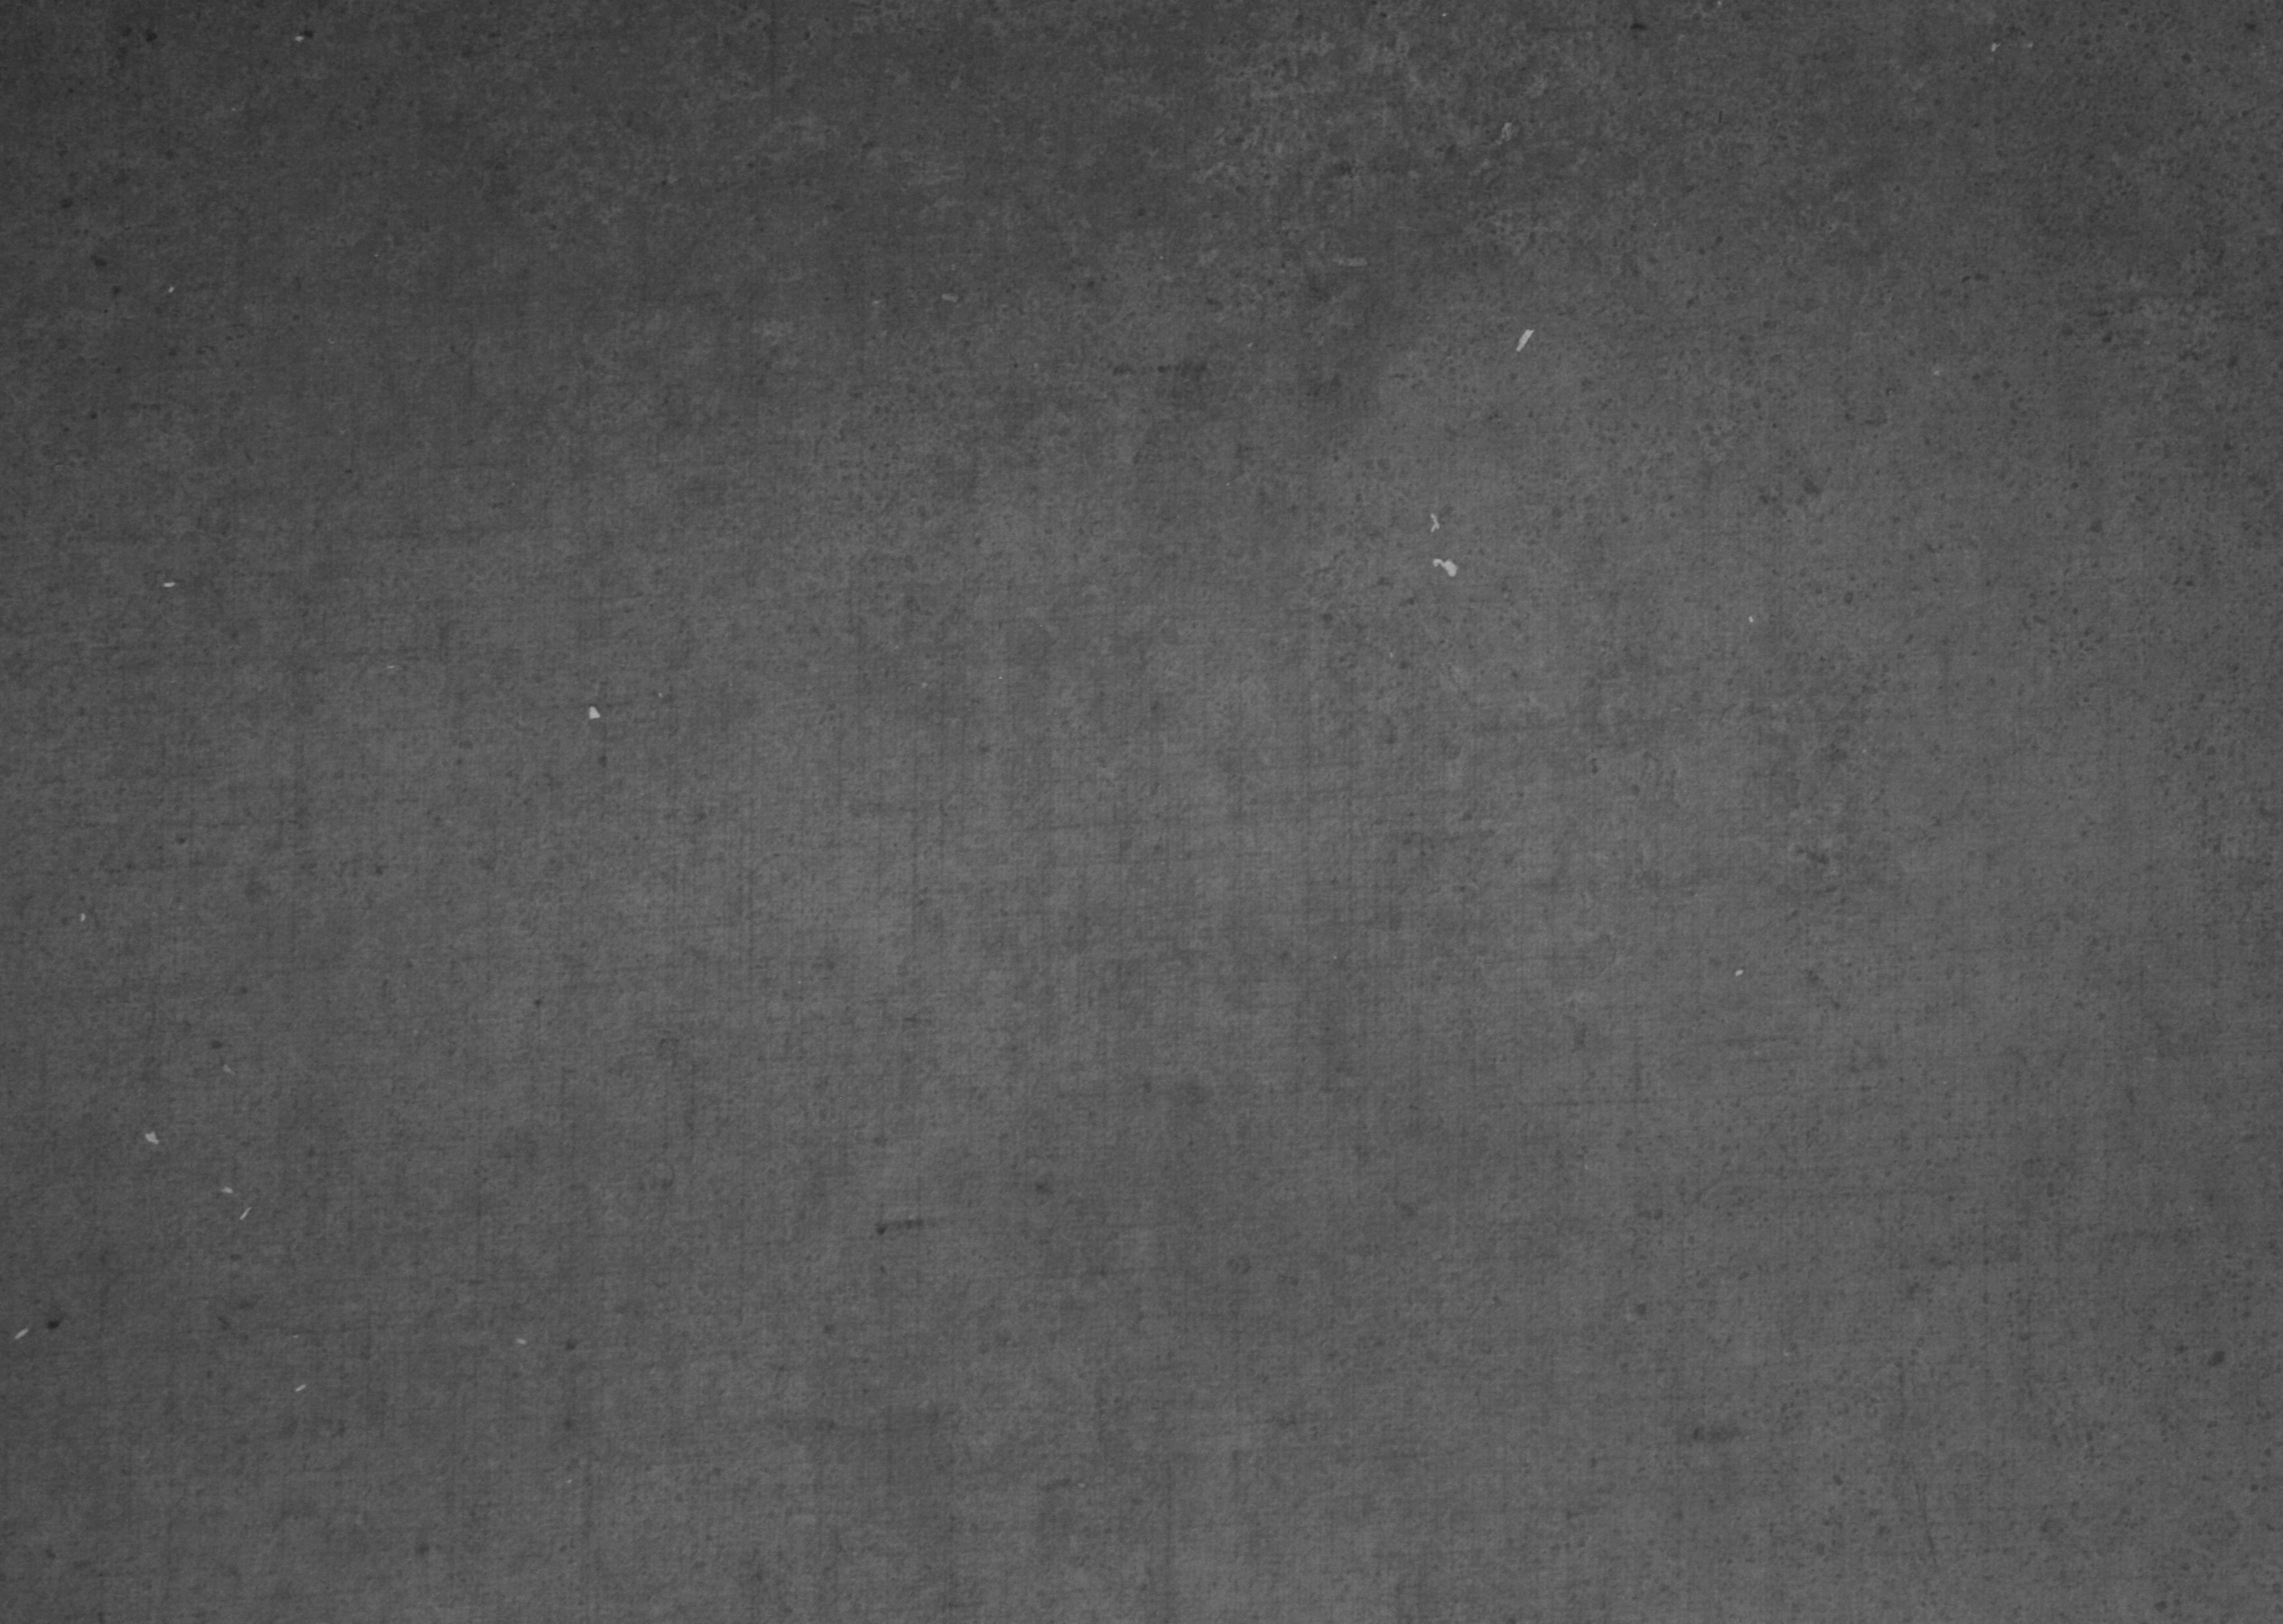 metallic-grey-grunge-textures-1 - L+T